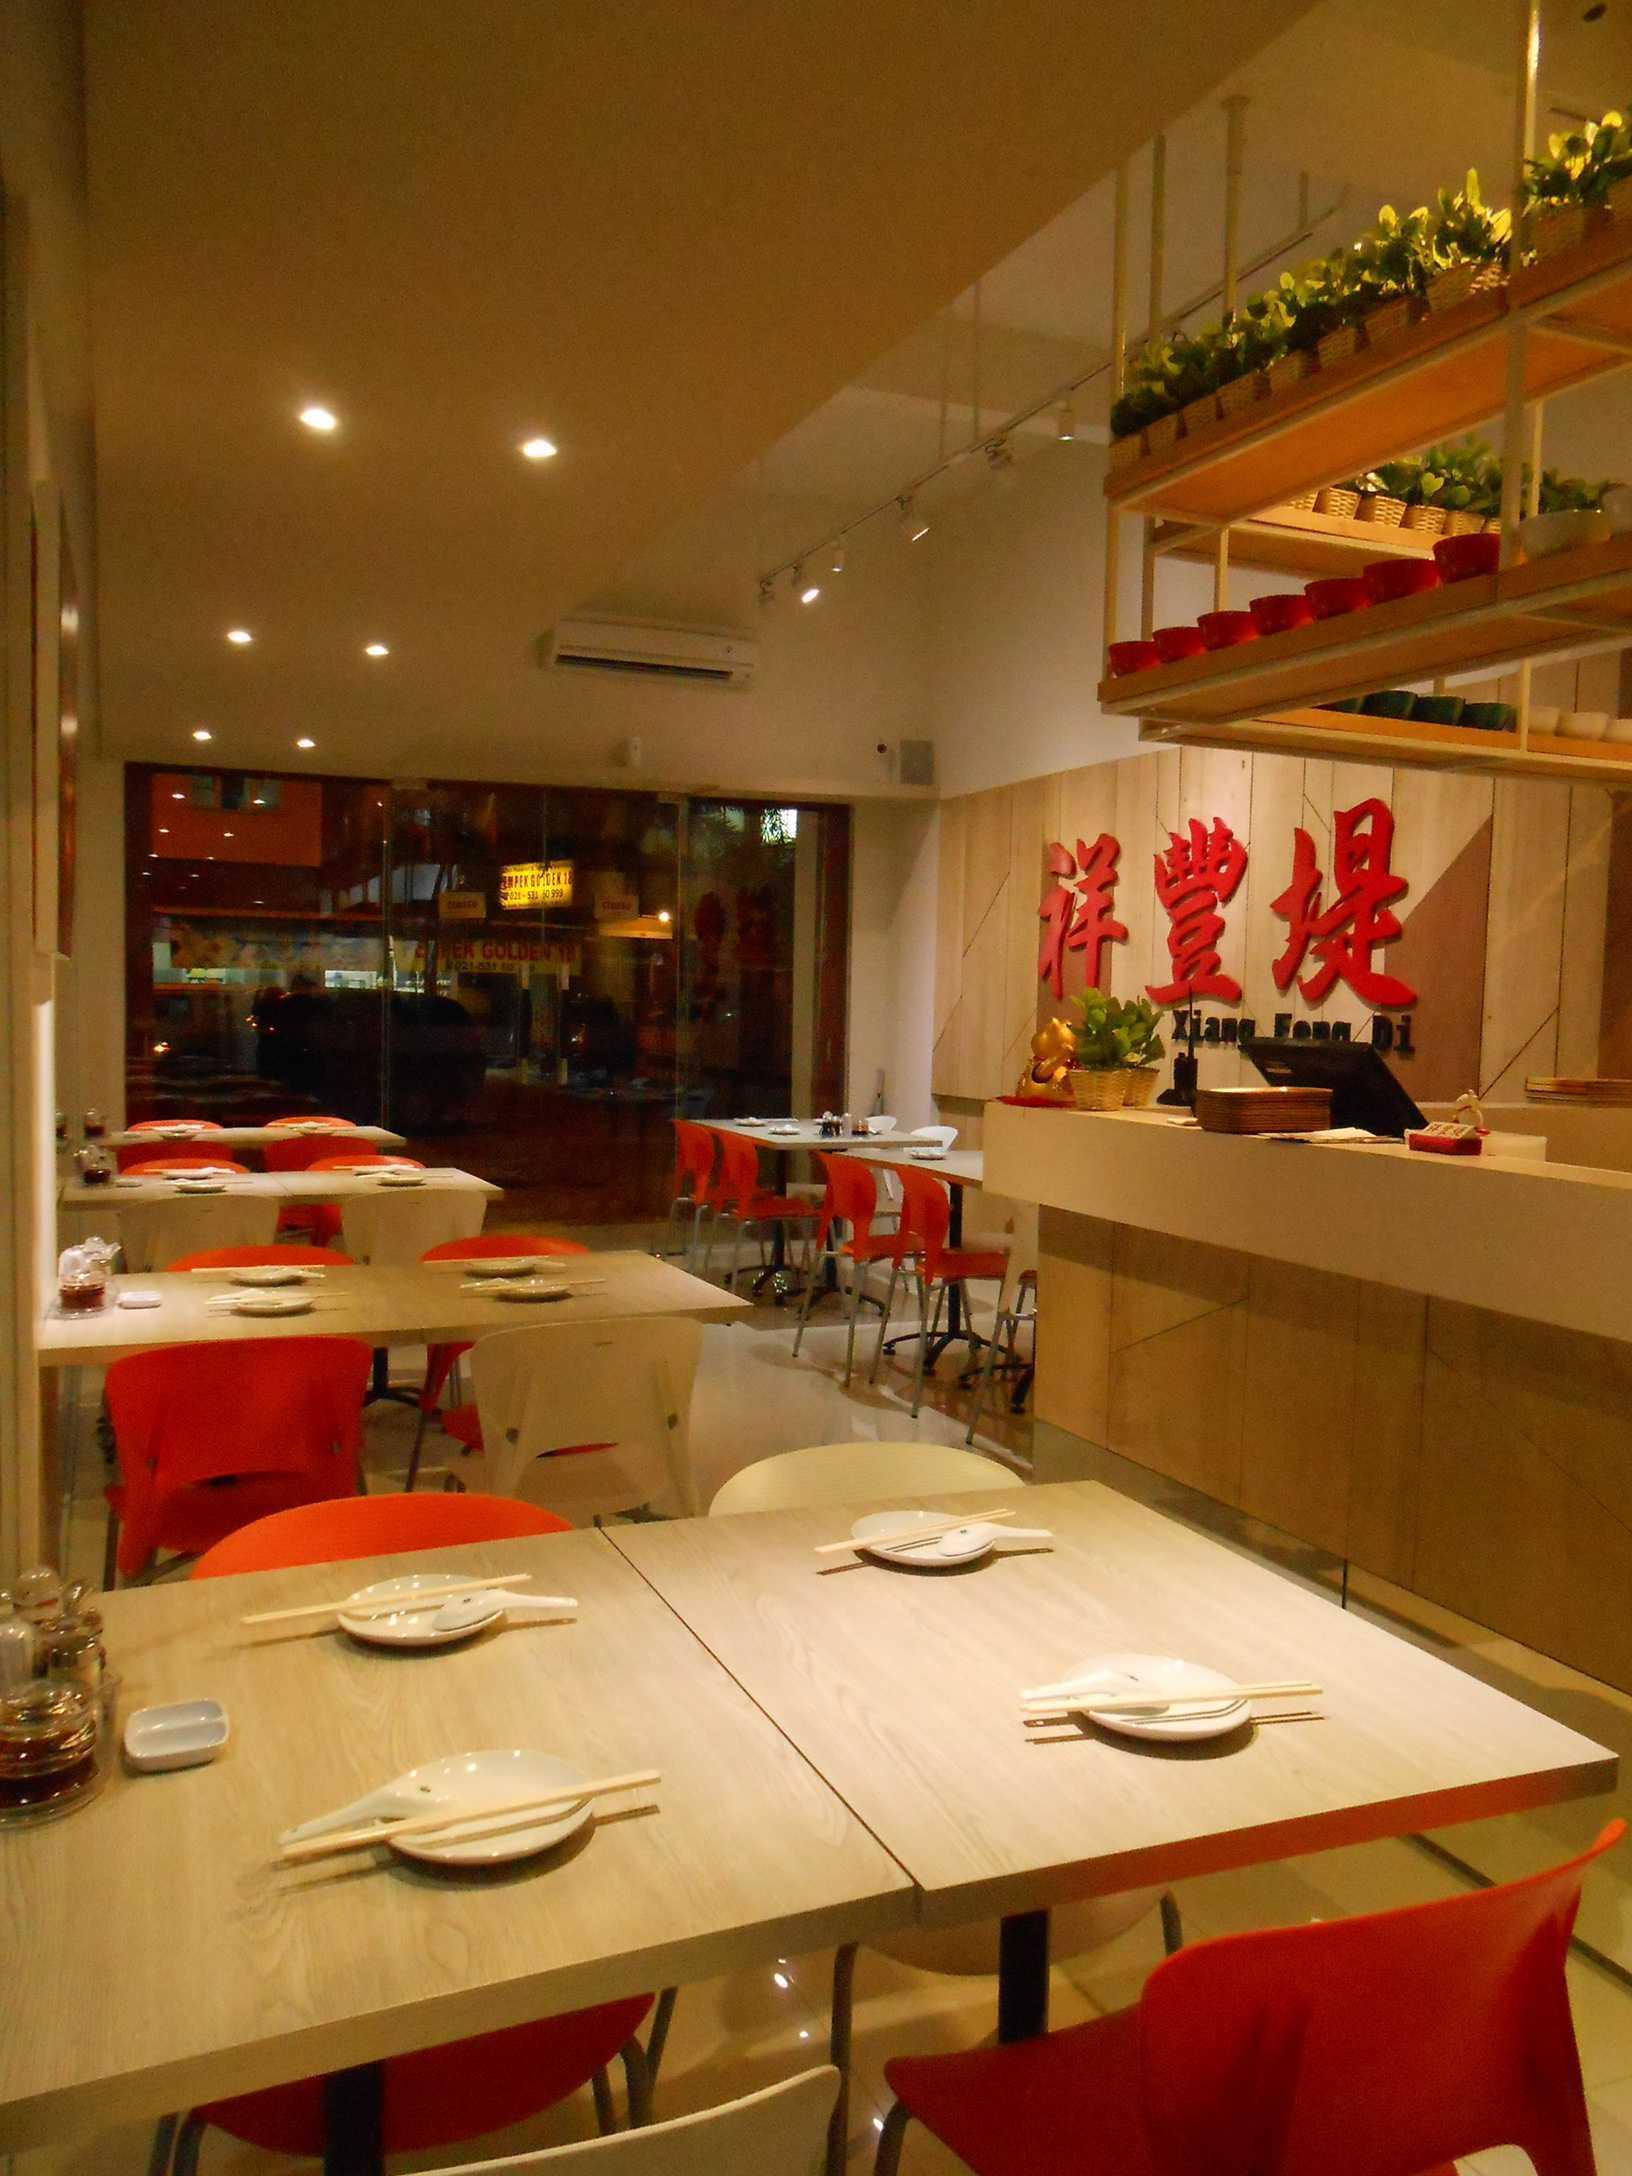 Studio Tektonik Resto Xian Feng Di Golden Boulevard, Jl. Raya Serpong, Lengkong Karya, Serpong Utara, Kota Tangerang Selatan, Banten 15310, Indonesia  013-Lr-2 Modern,asian  31682